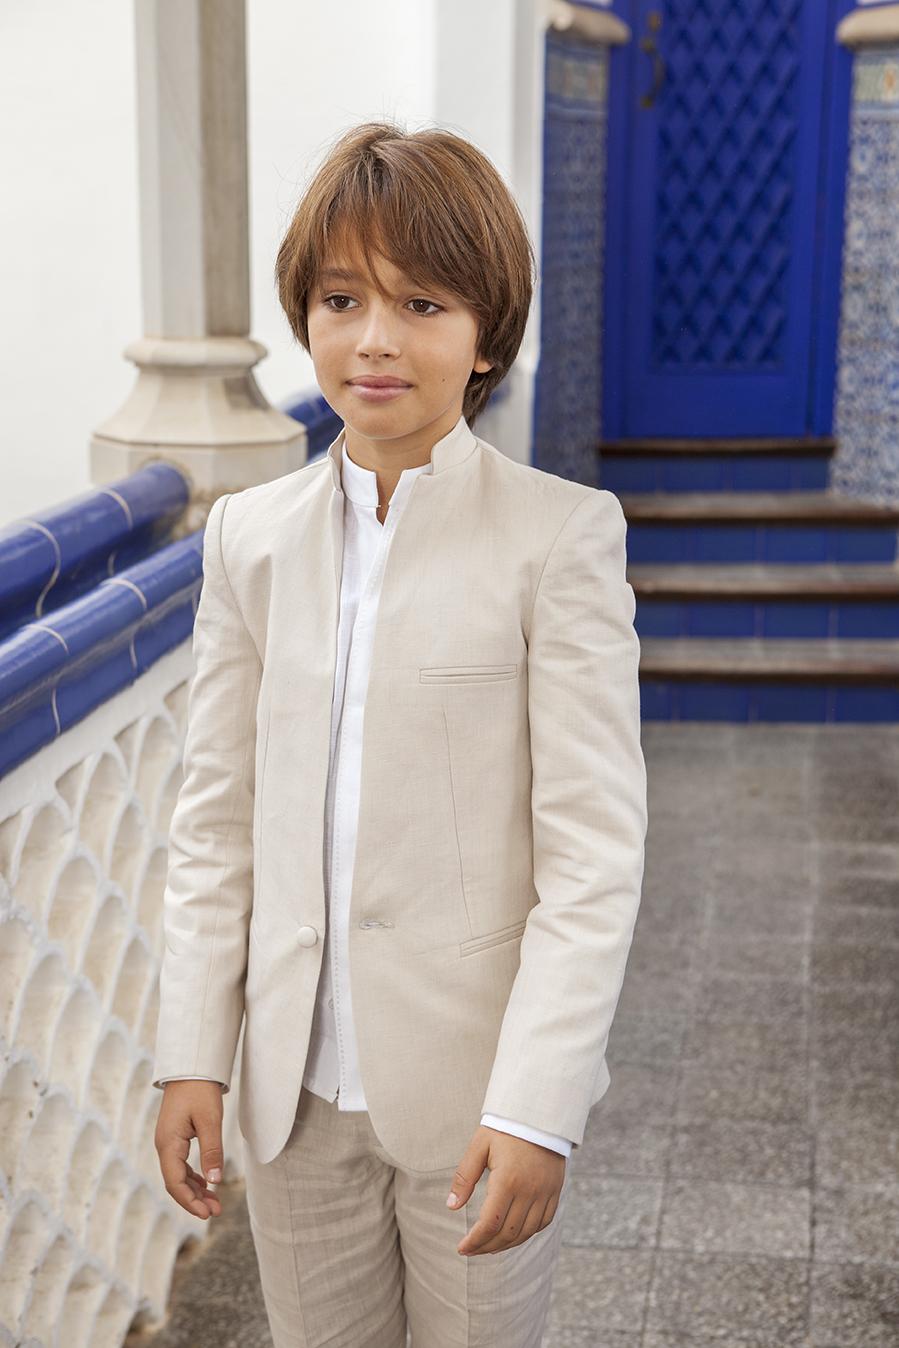 San Francisco calidad reloj Trajes Comunion niño lino Manuel Pardo Moda Masculina